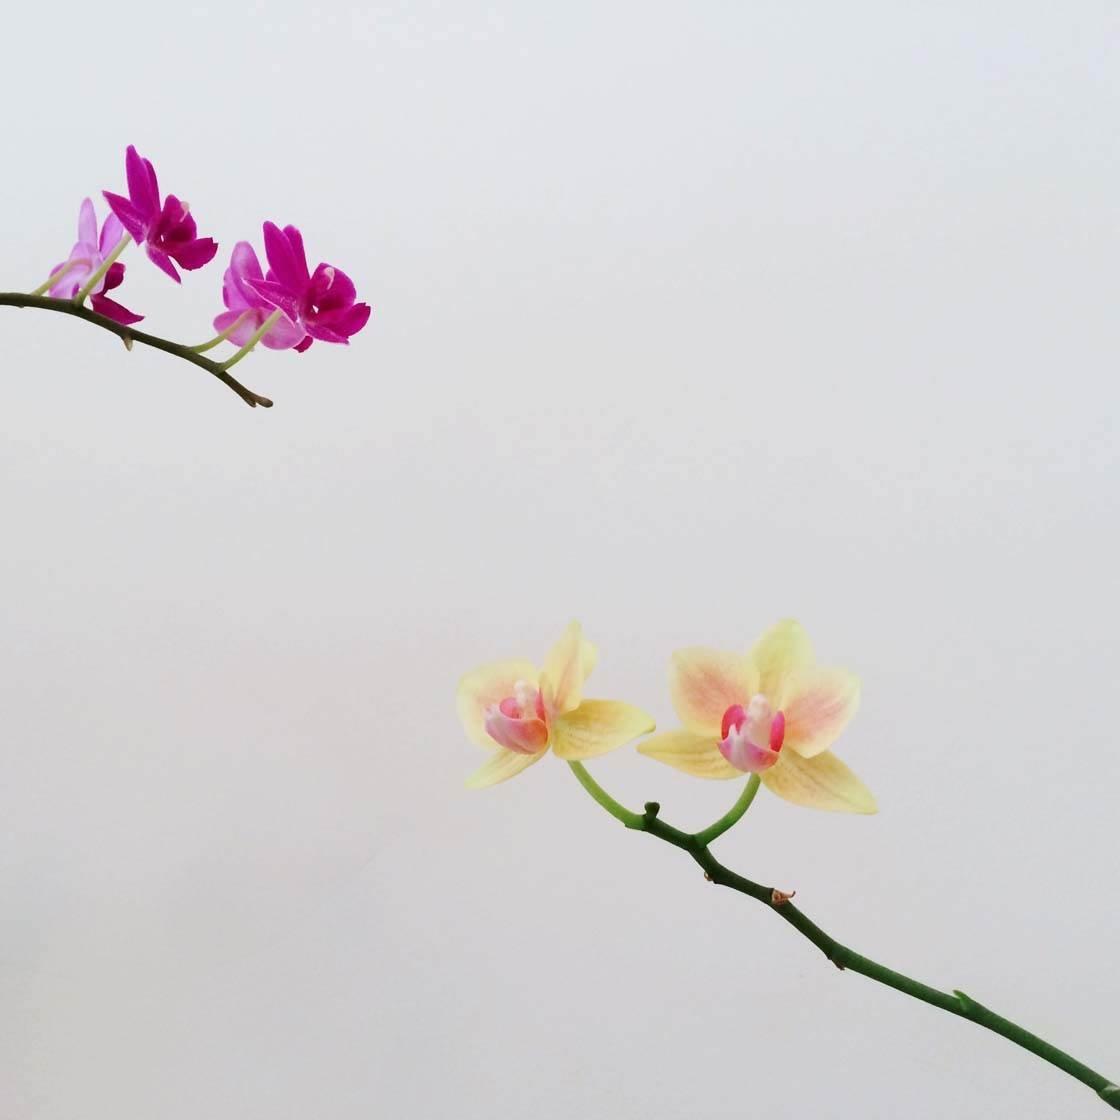 iPhone Flower Photography 25 no script